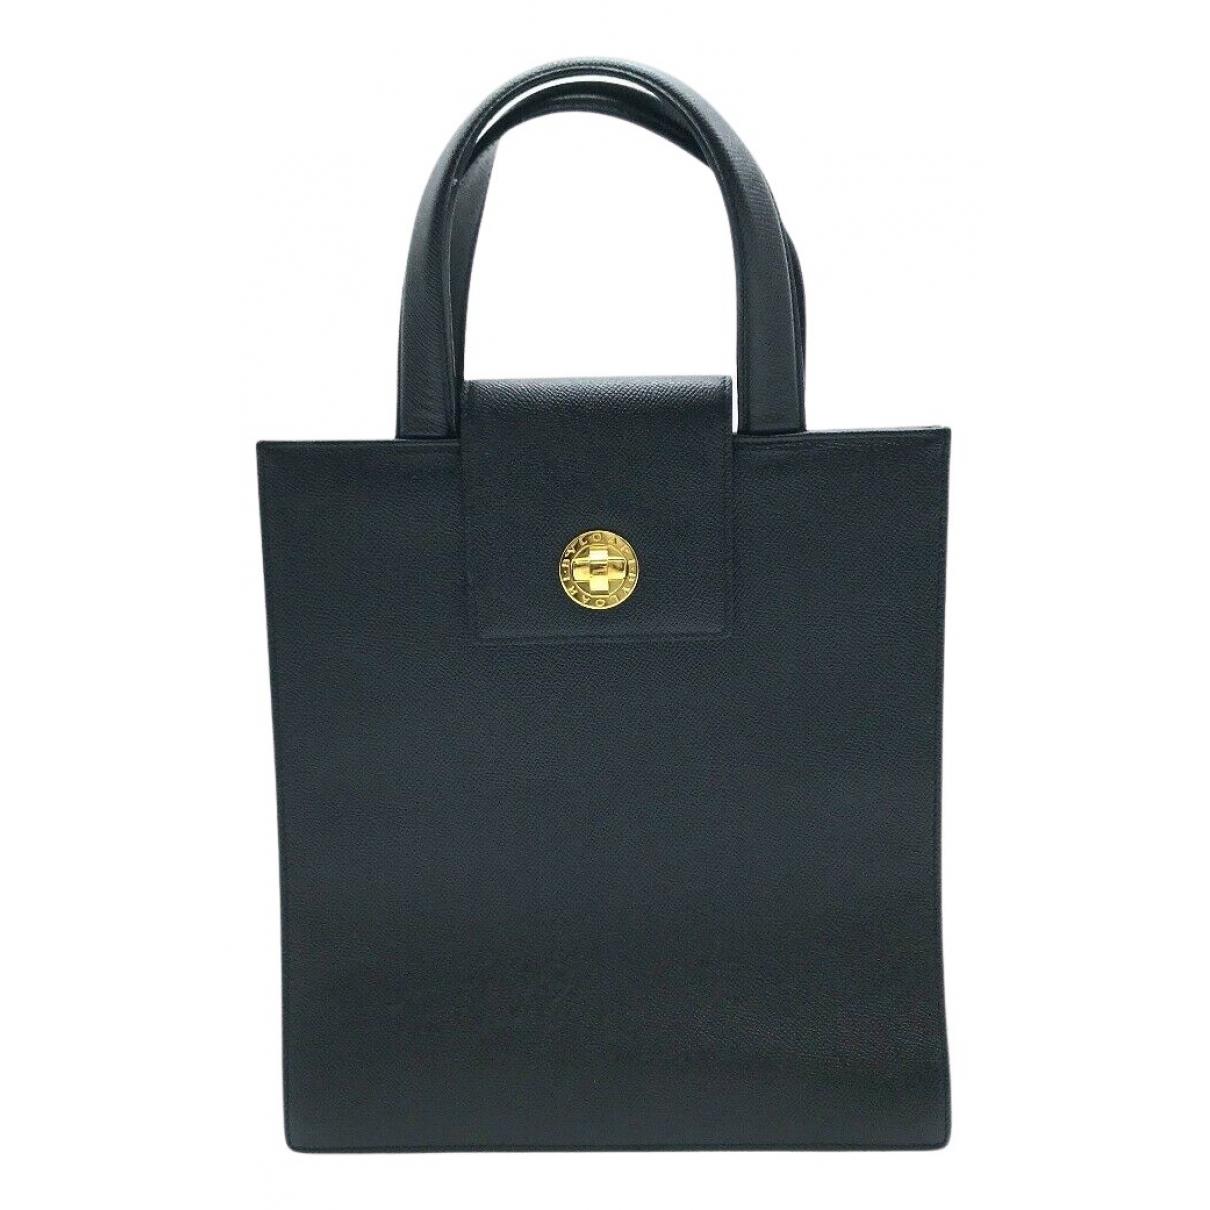 Bvlgari N Black Leather handbag for Women N